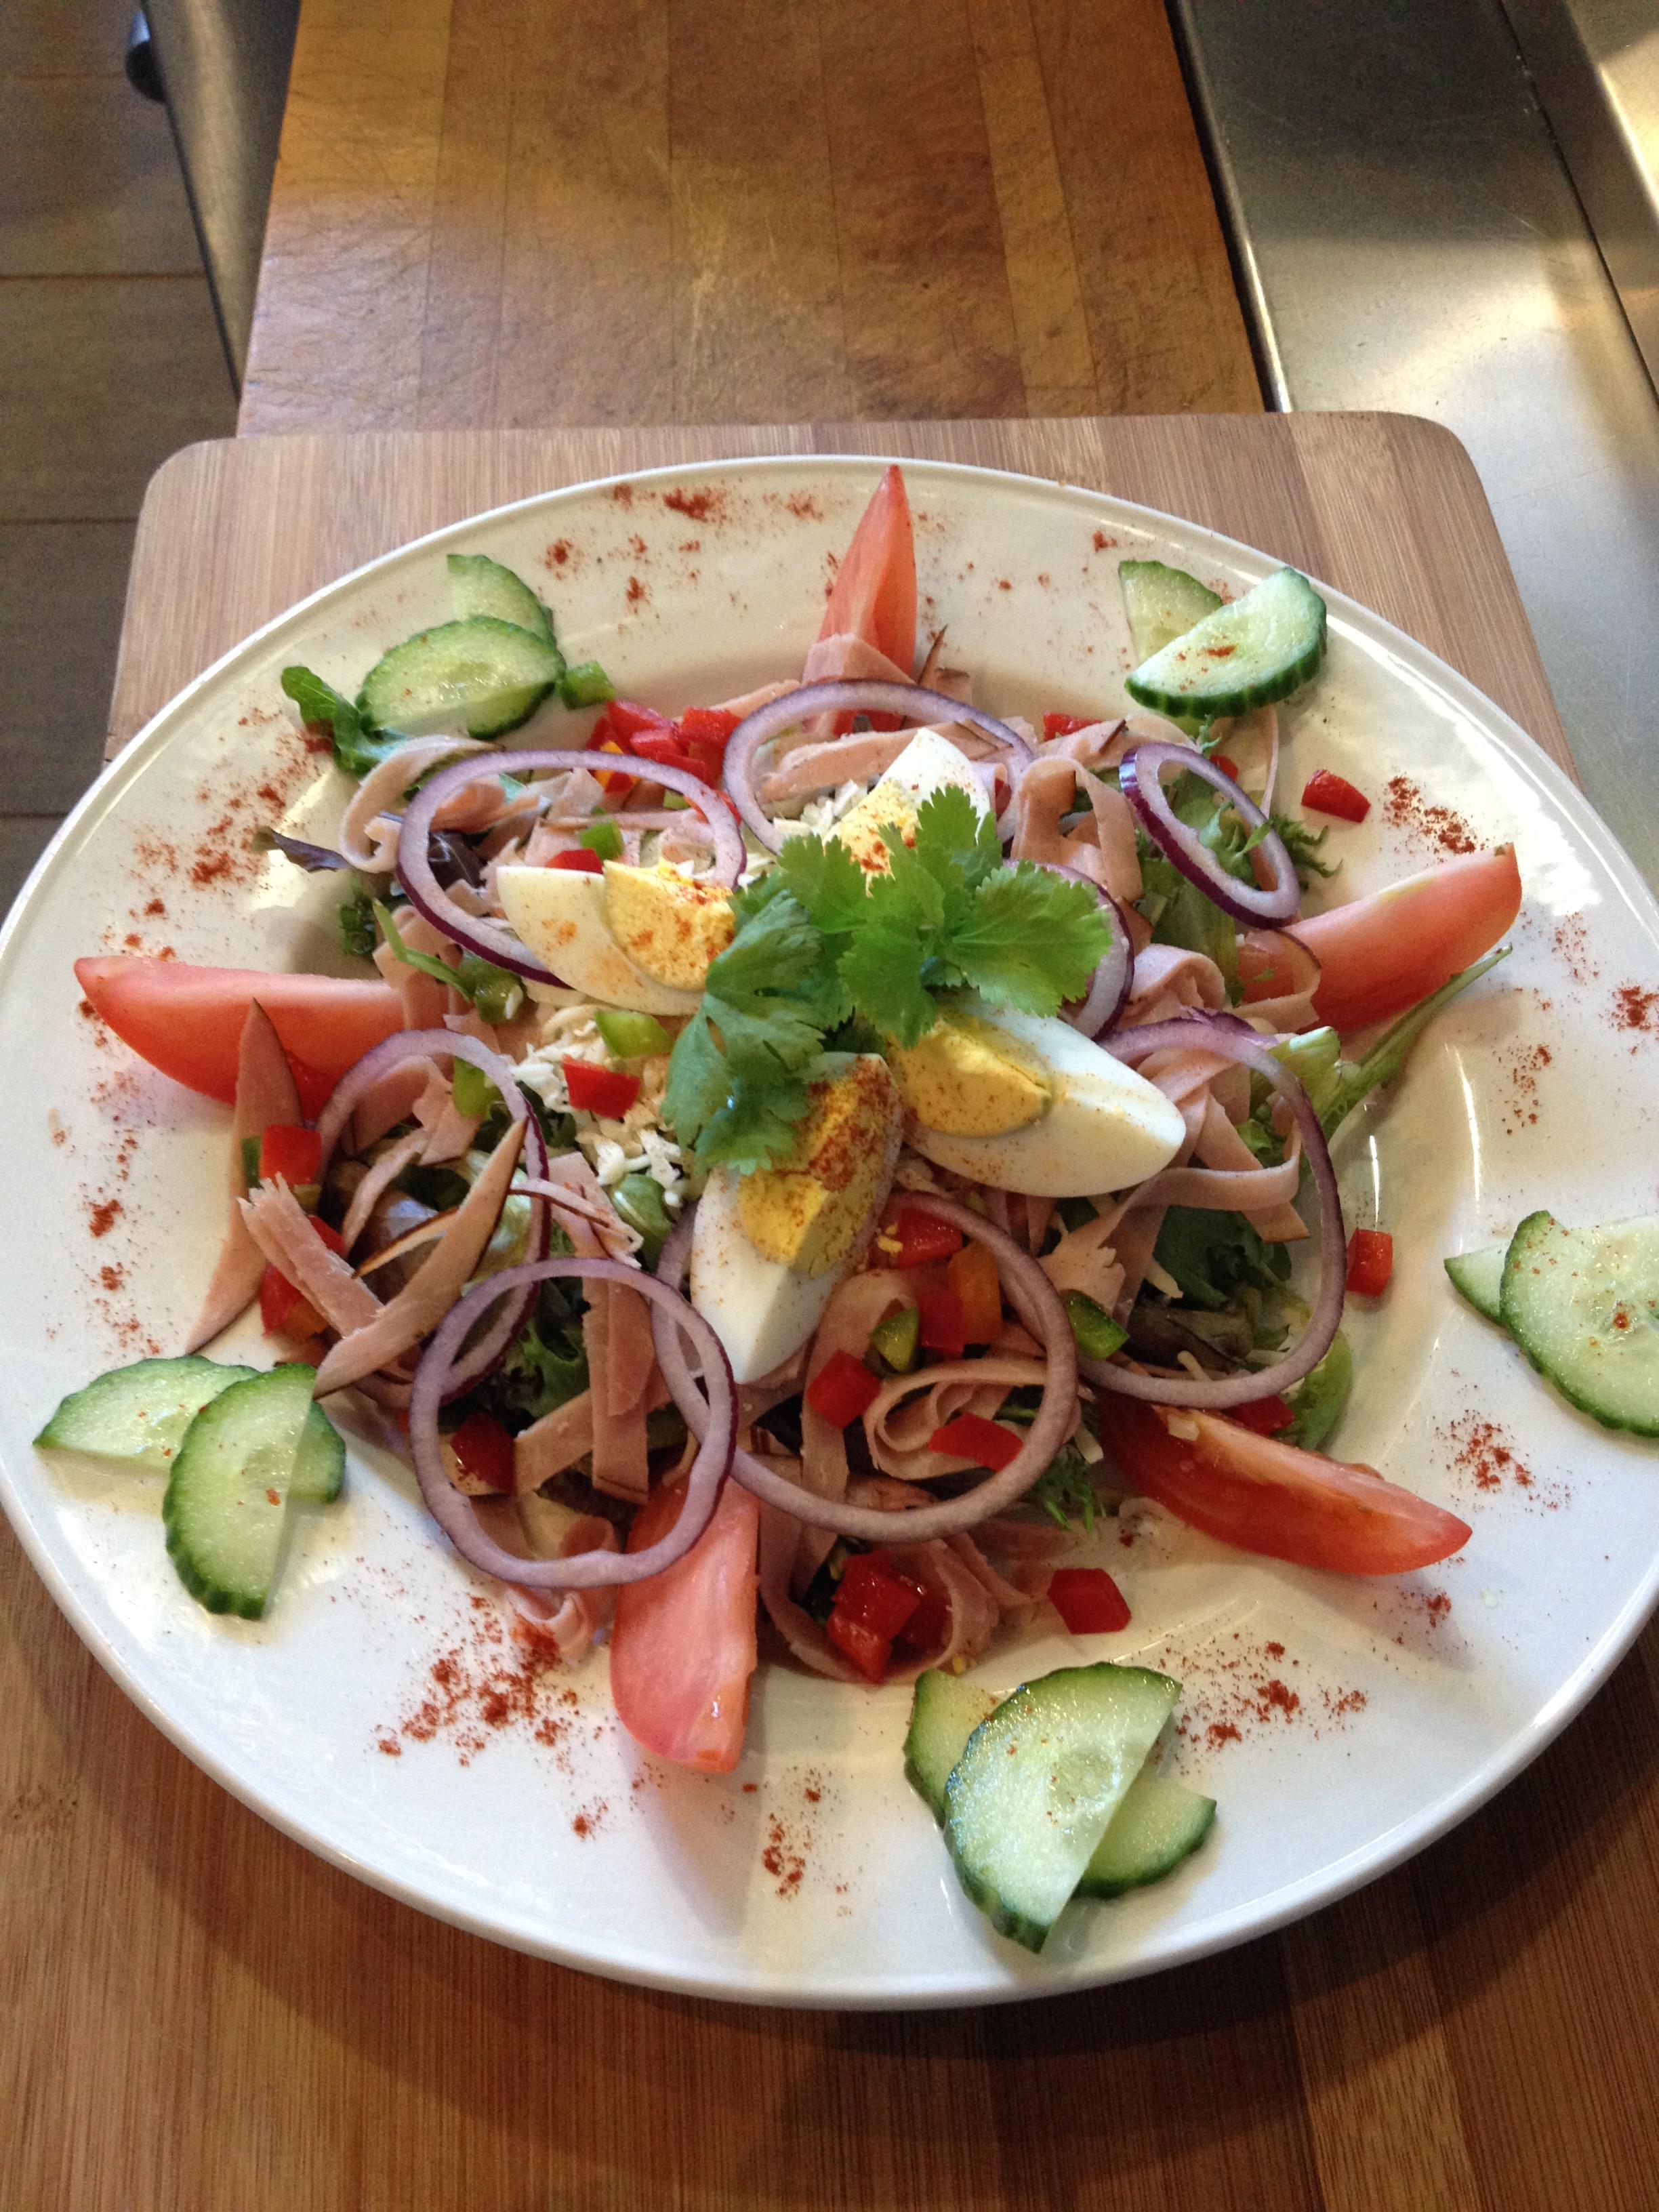 Salade repas le midi